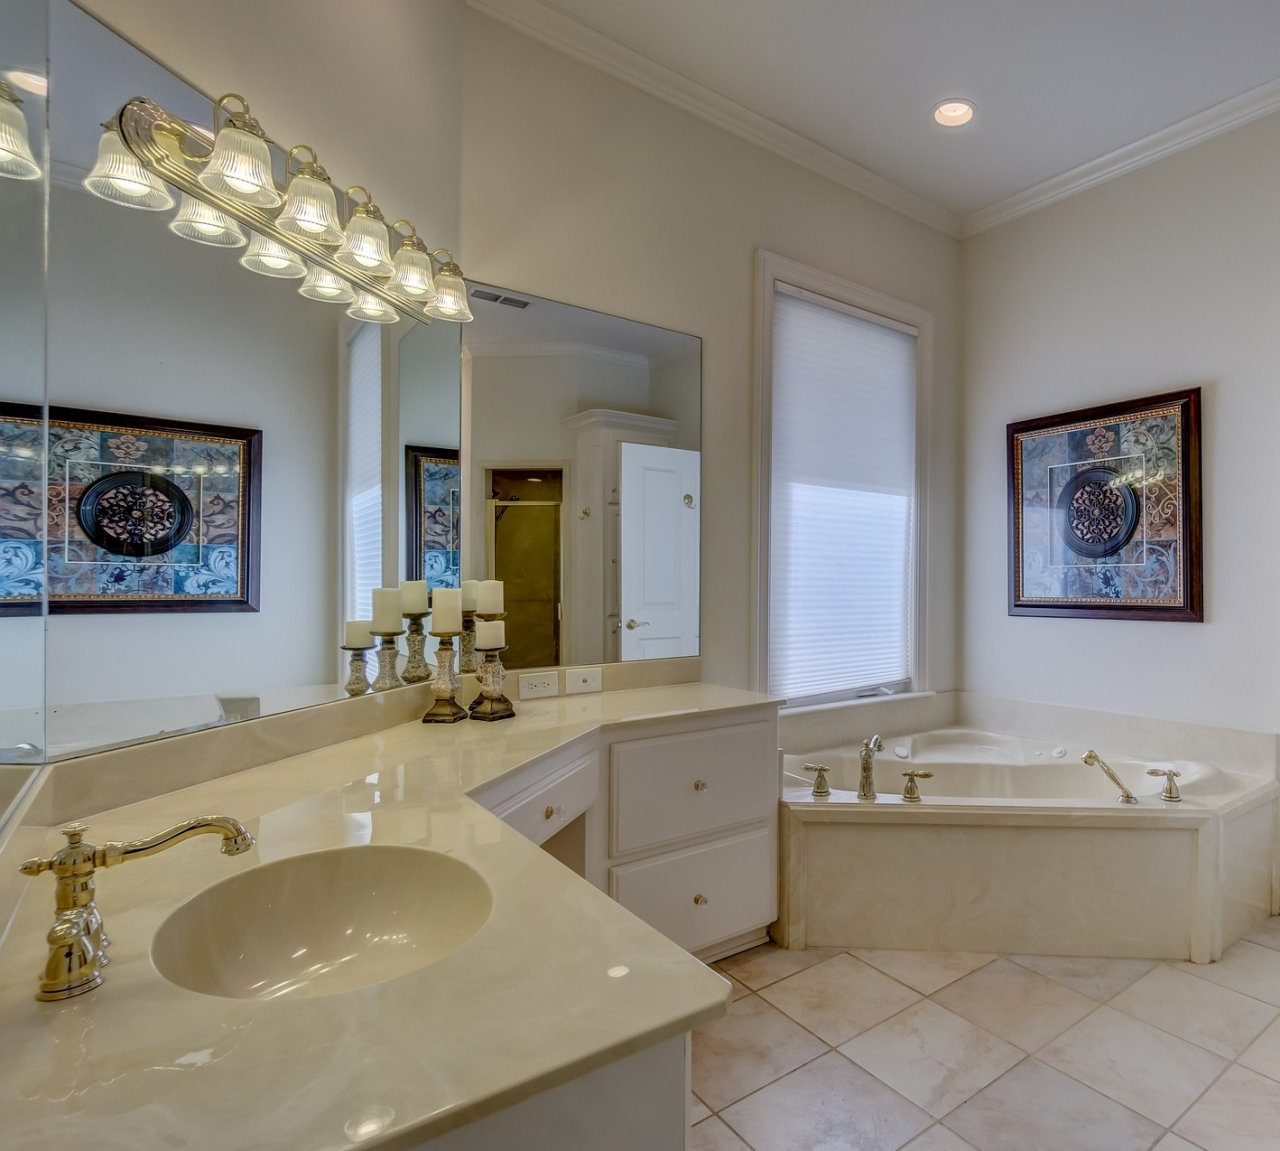 Vasche da bagno esterne simple vasca da bagno ad angolo - Vasche da bagno esterne ...